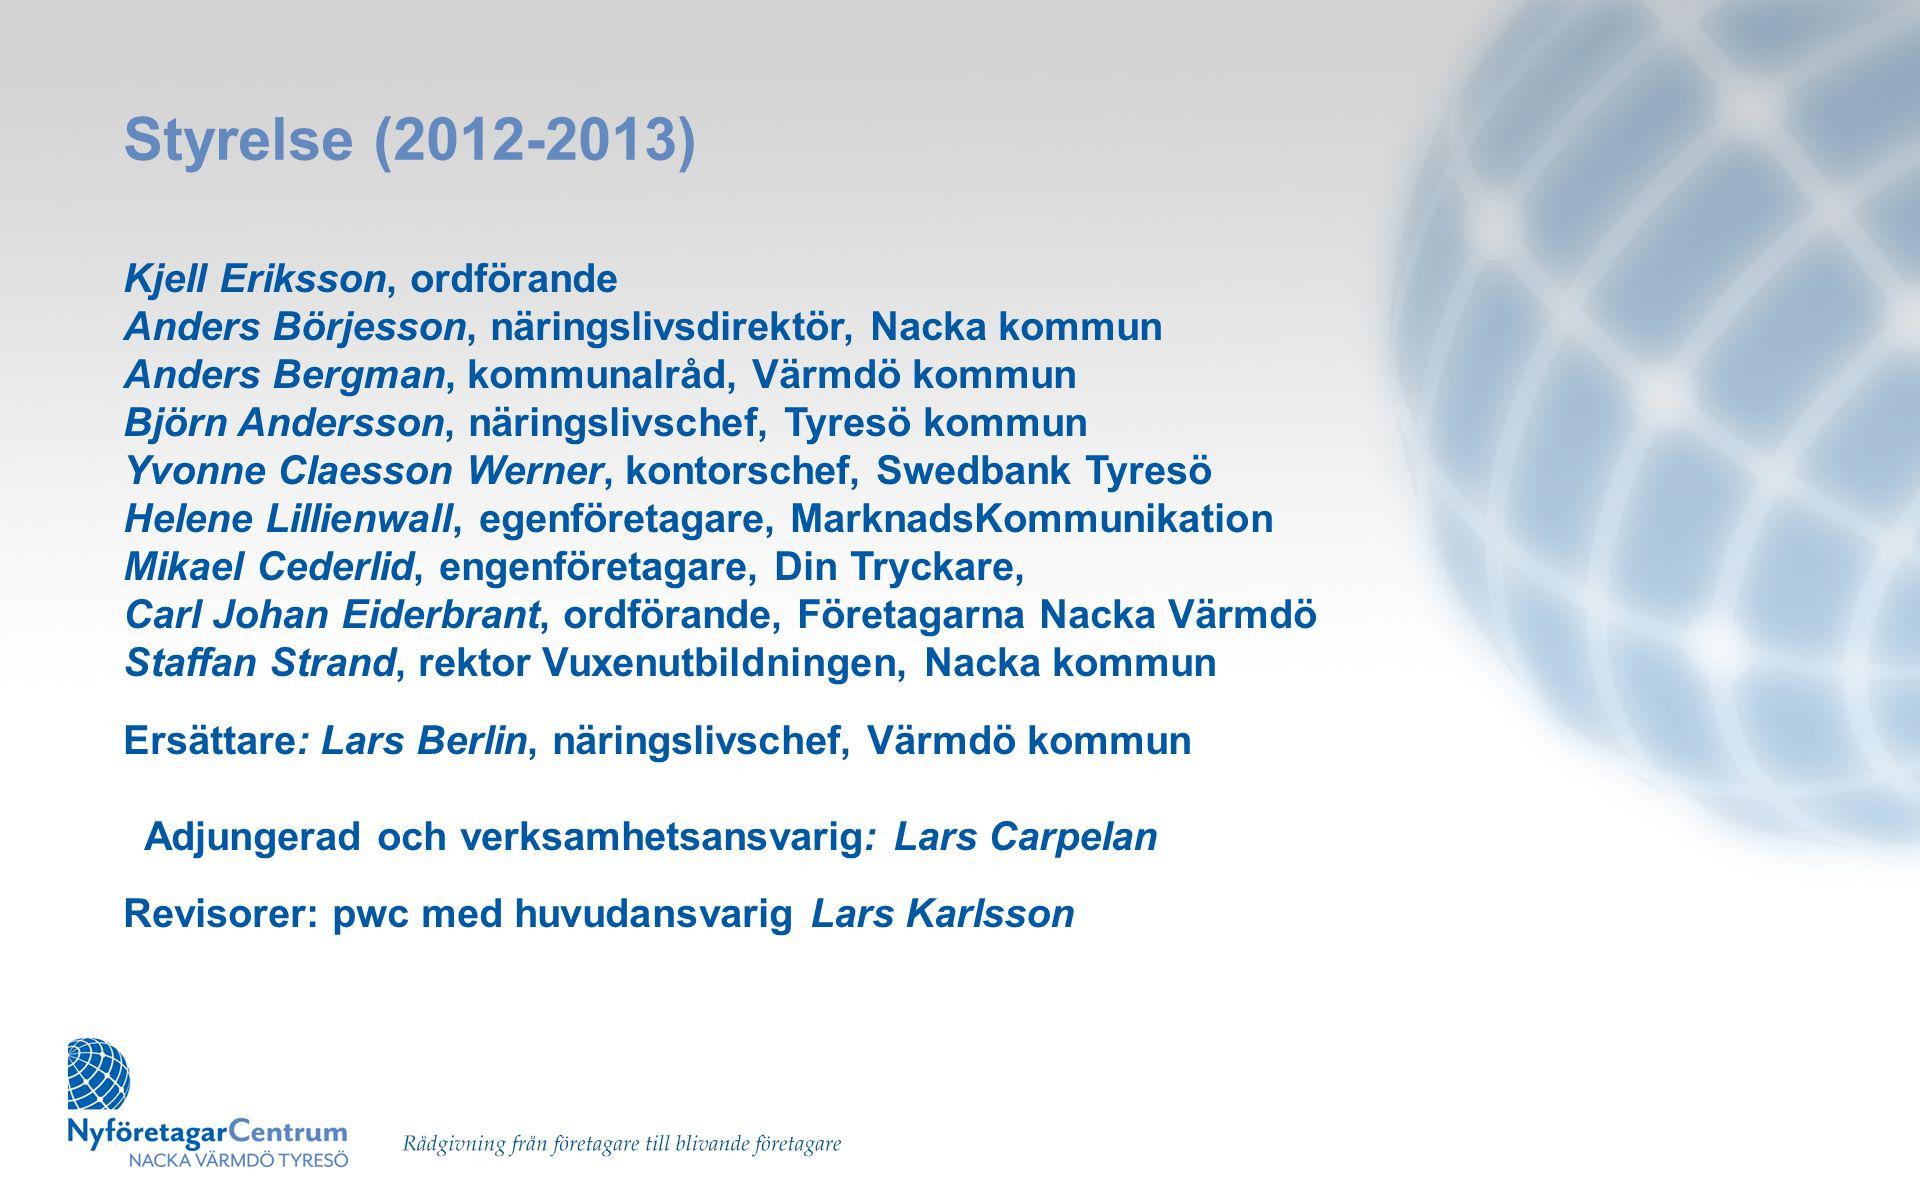 Styrelse (2012-2013)